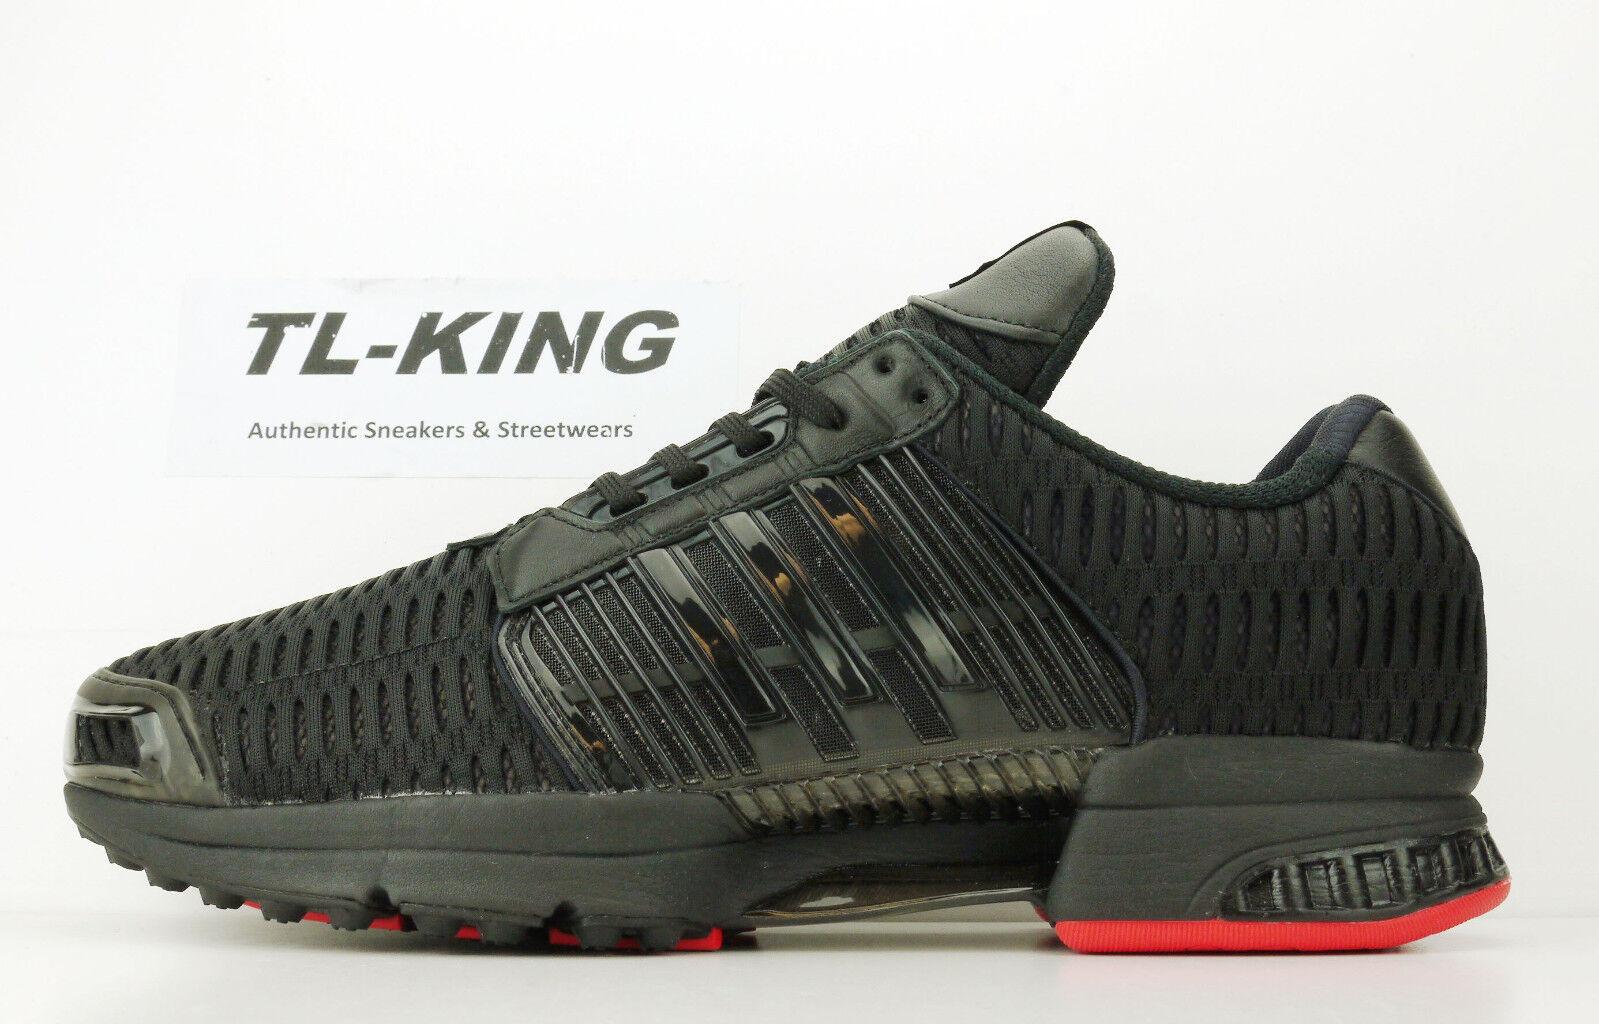 Adidas Consortium Cool X Shoe Gallery Clima Cool Consortium 1 CC1 Flight 305 BB3303 Msrp 150 DI f234bc